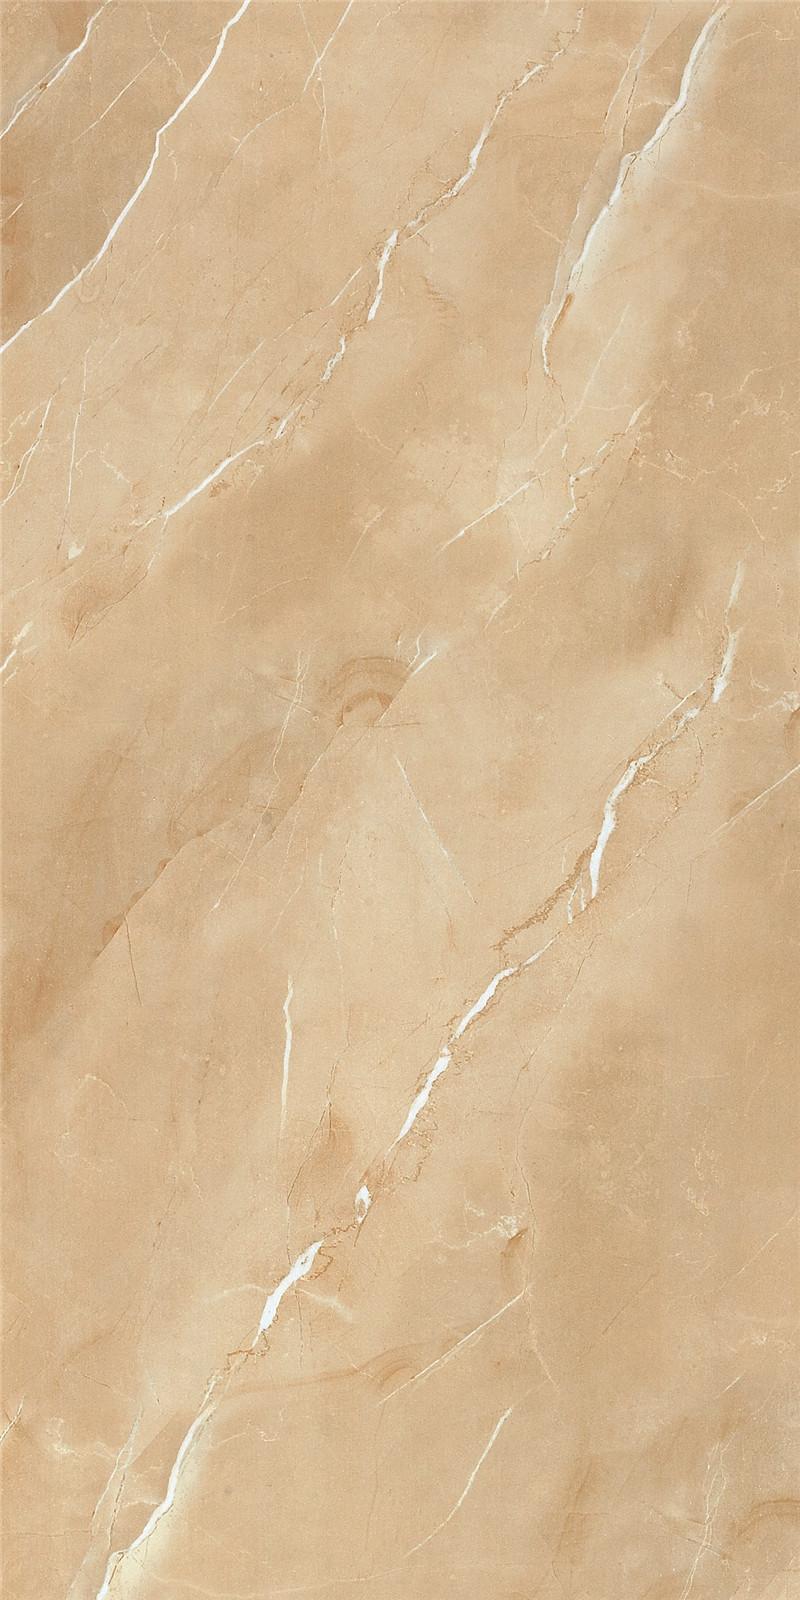 diamond-shaped best bathroom tiles gold excellent decorative effect School-9